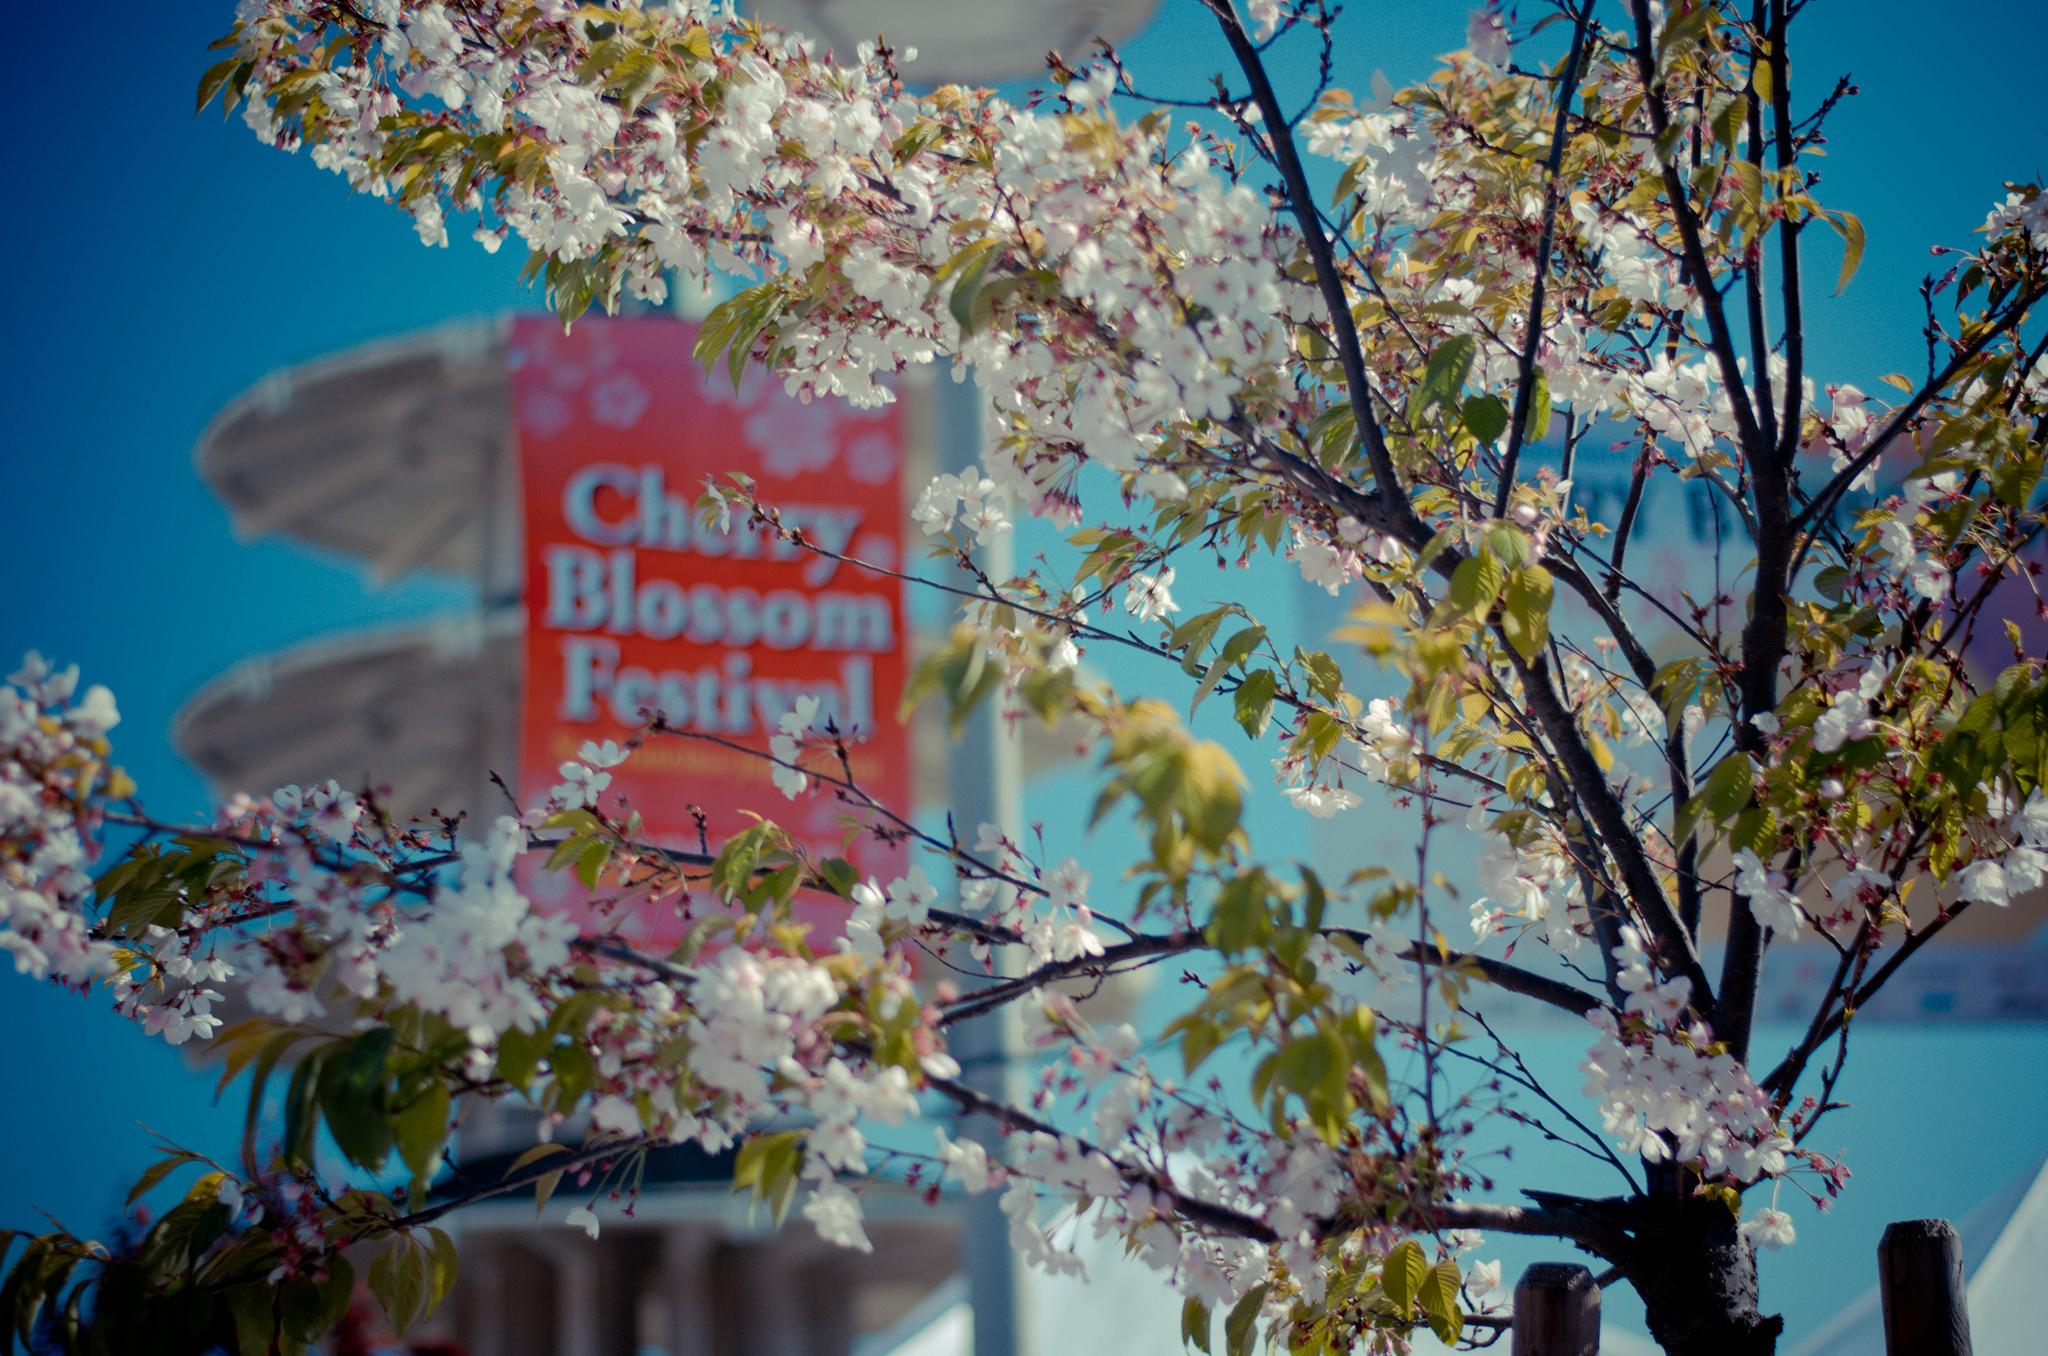 cherry blossom festival 2020 - HD1920×1271